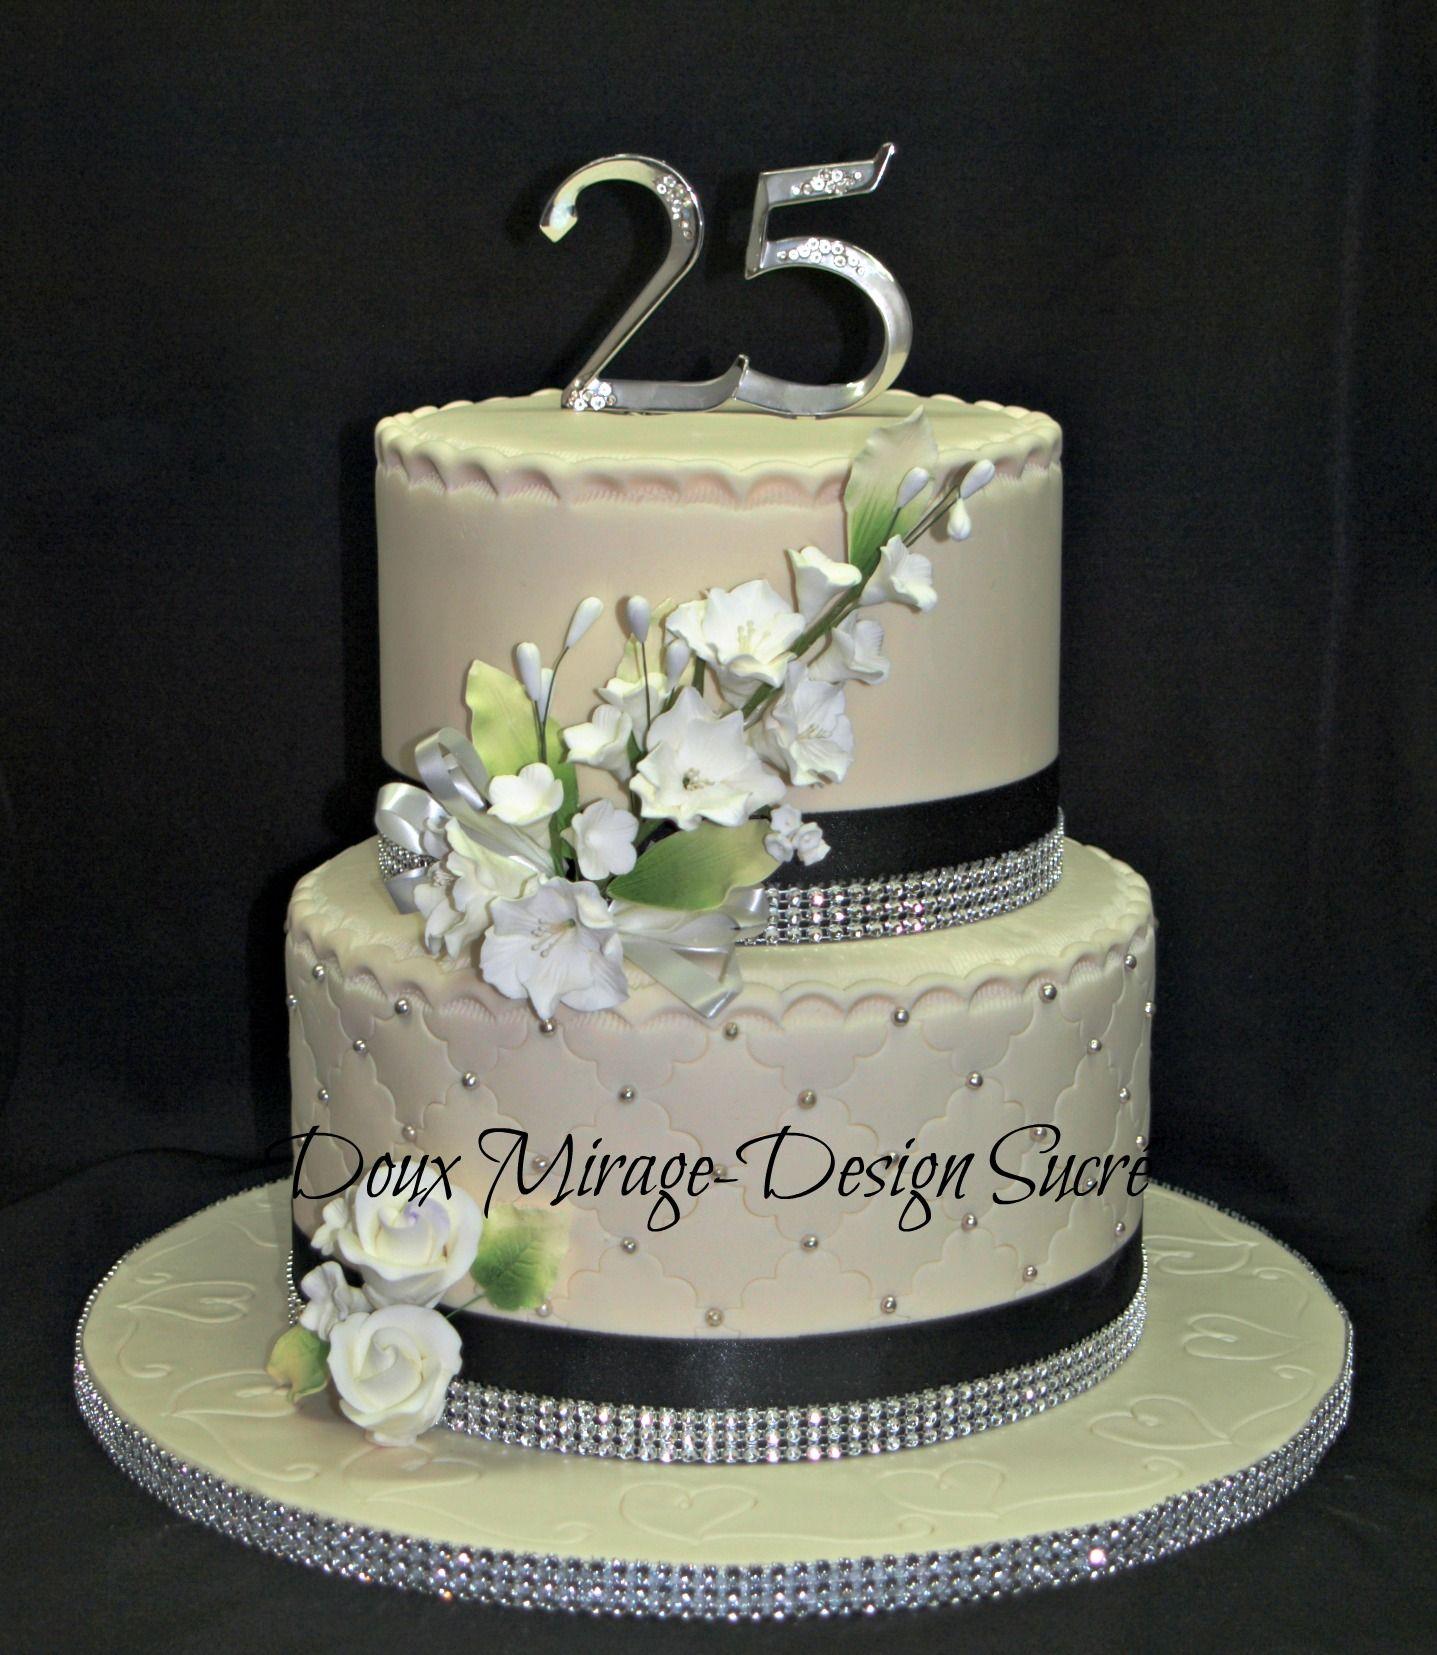 g teau 25e anniversaire de mariage 25 wedding anniversary cake doux mirage design sucr. Black Bedroom Furniture Sets. Home Design Ideas